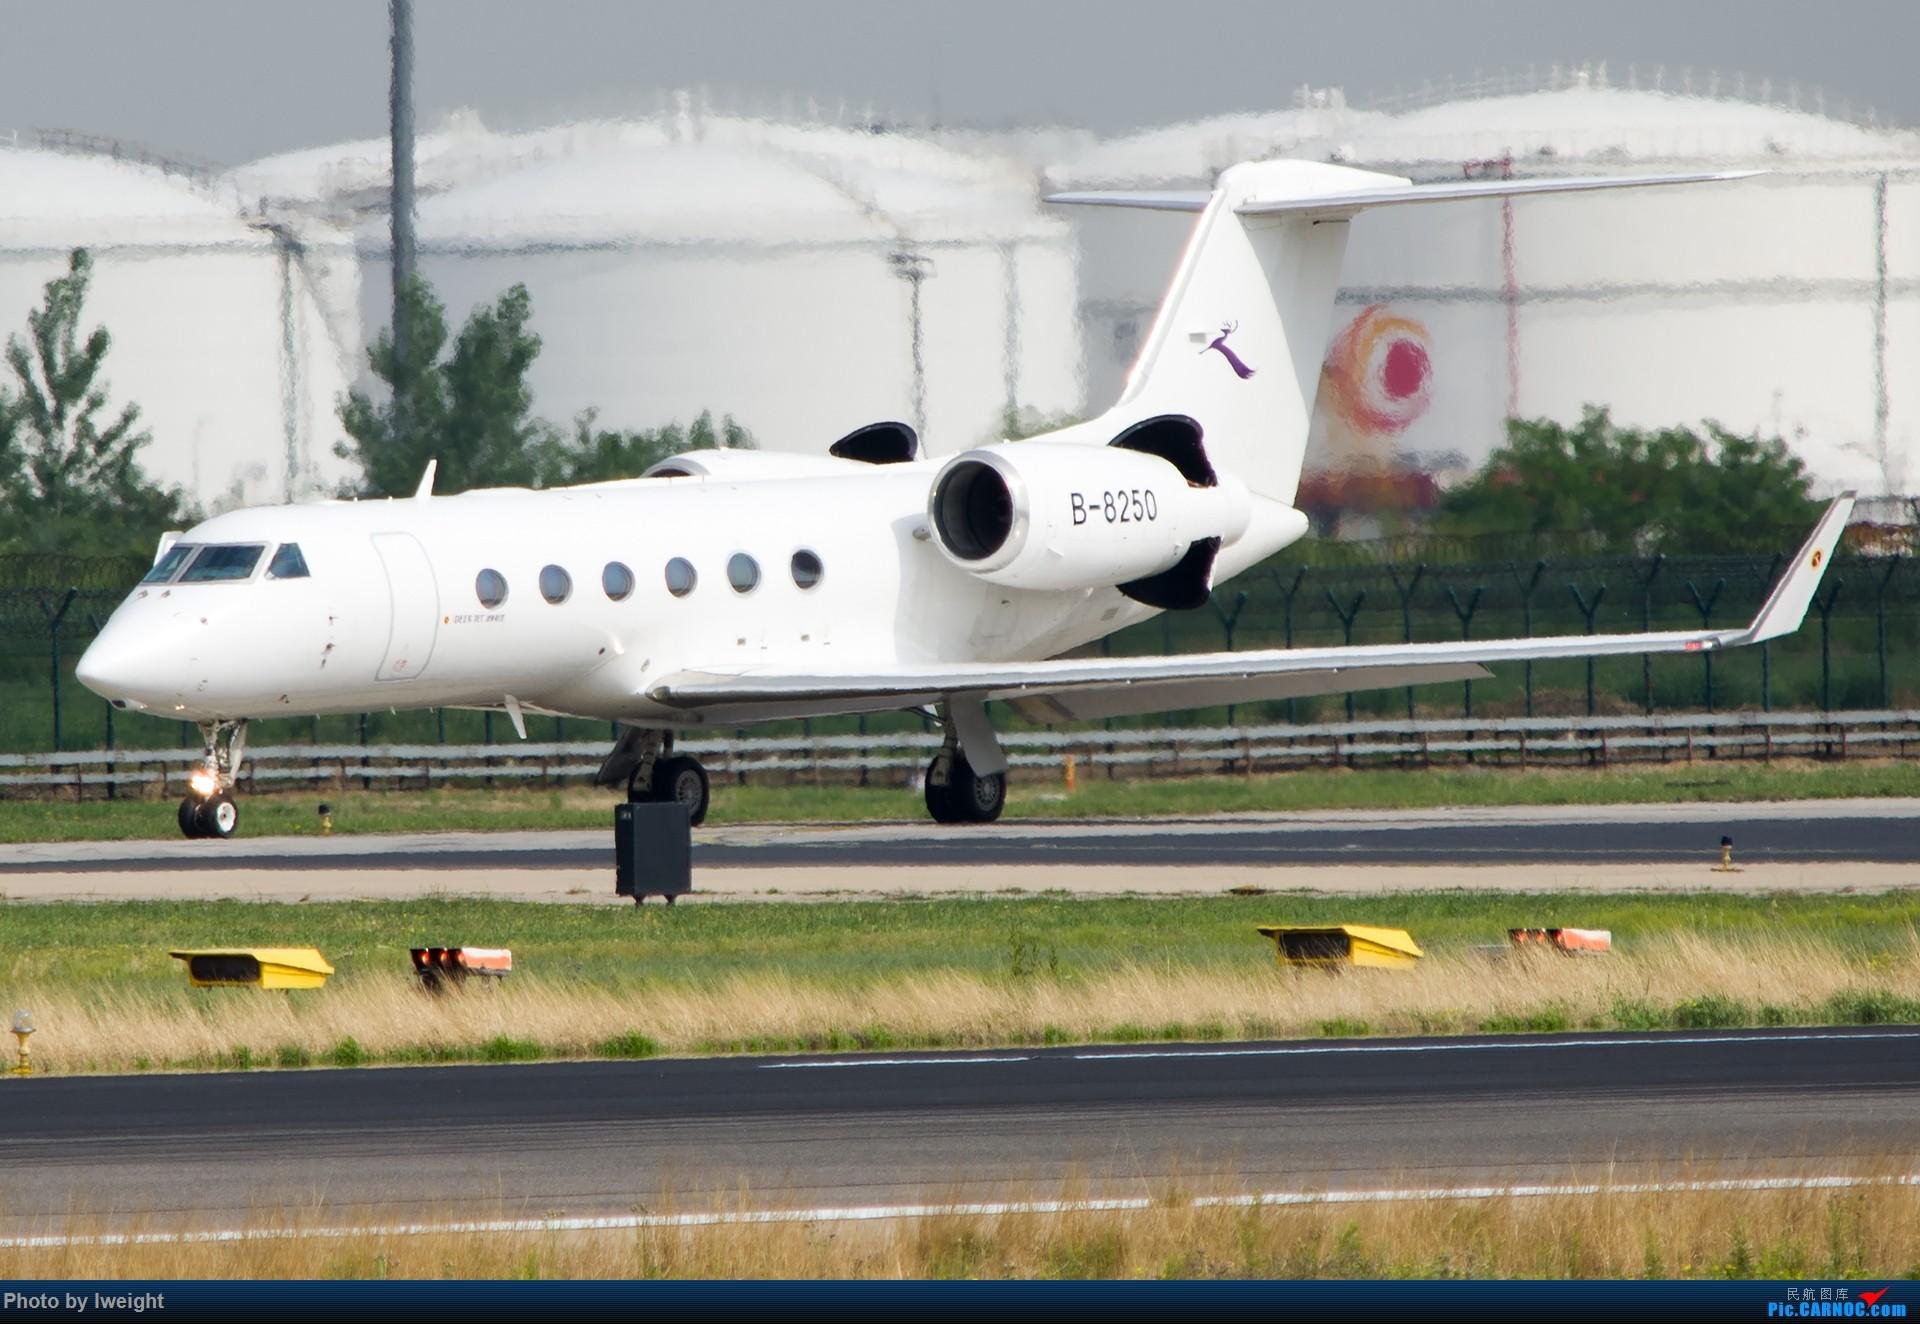 PEK 18R滑行道上开着反推向前!向前!向前! GULFSTREAM G450 B-8250 中国北京首都国际机场